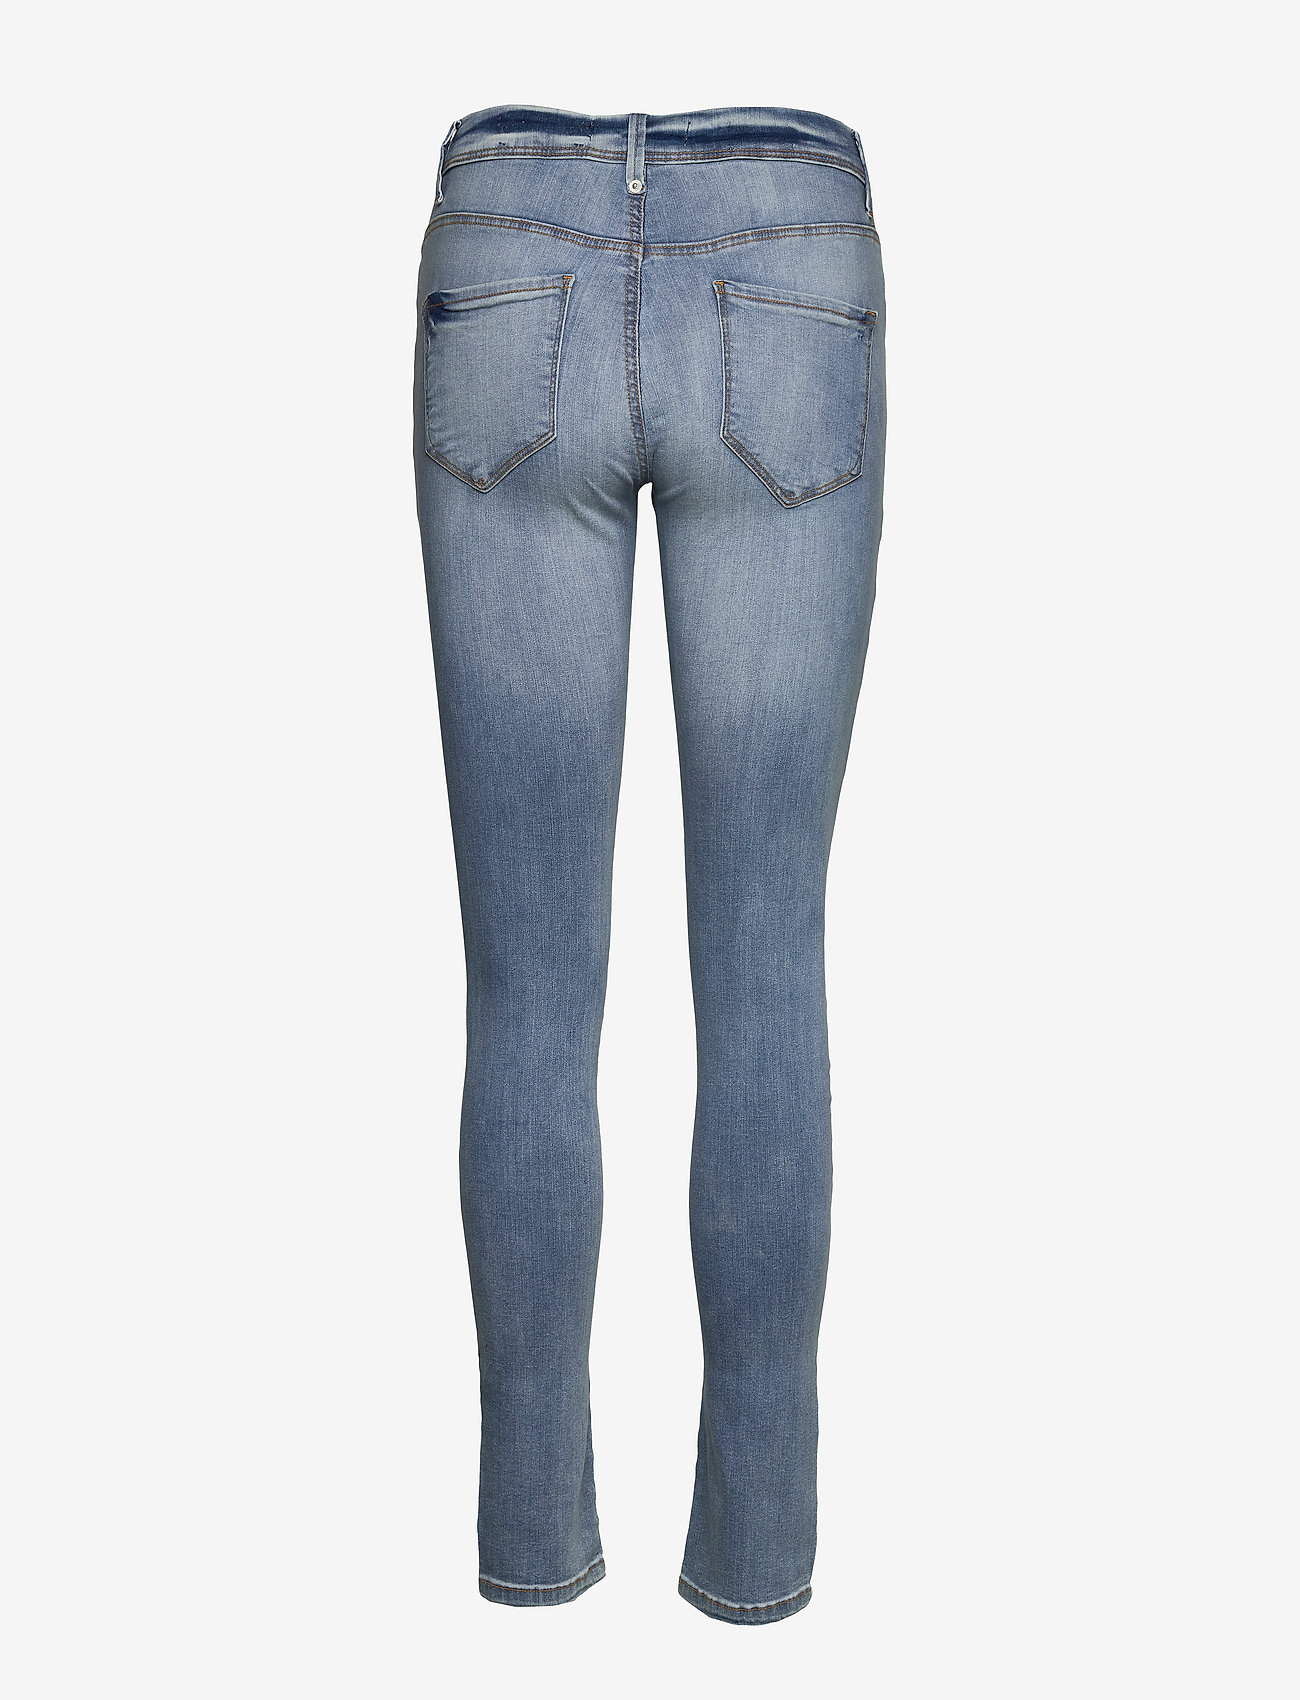 ICHI - IHERIN IZARO LIGHT BLUE BLEACHED - skinny jeans - bleached light blue - 1